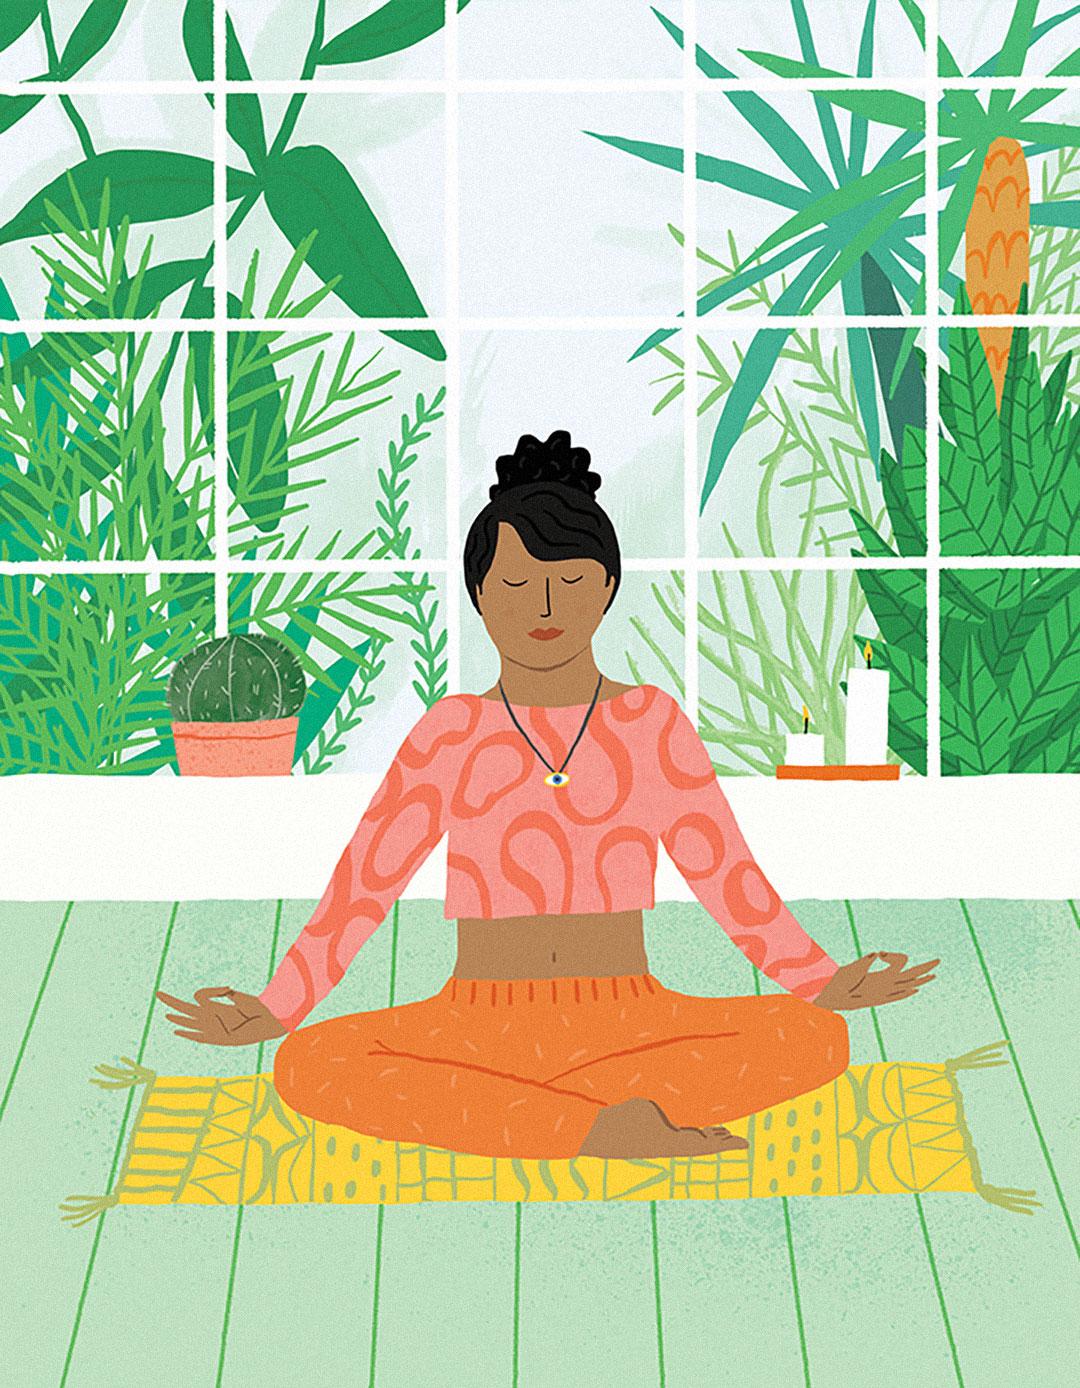 Иллюстрация: Ruby Taylor. Истоник: Central Illustration Agency